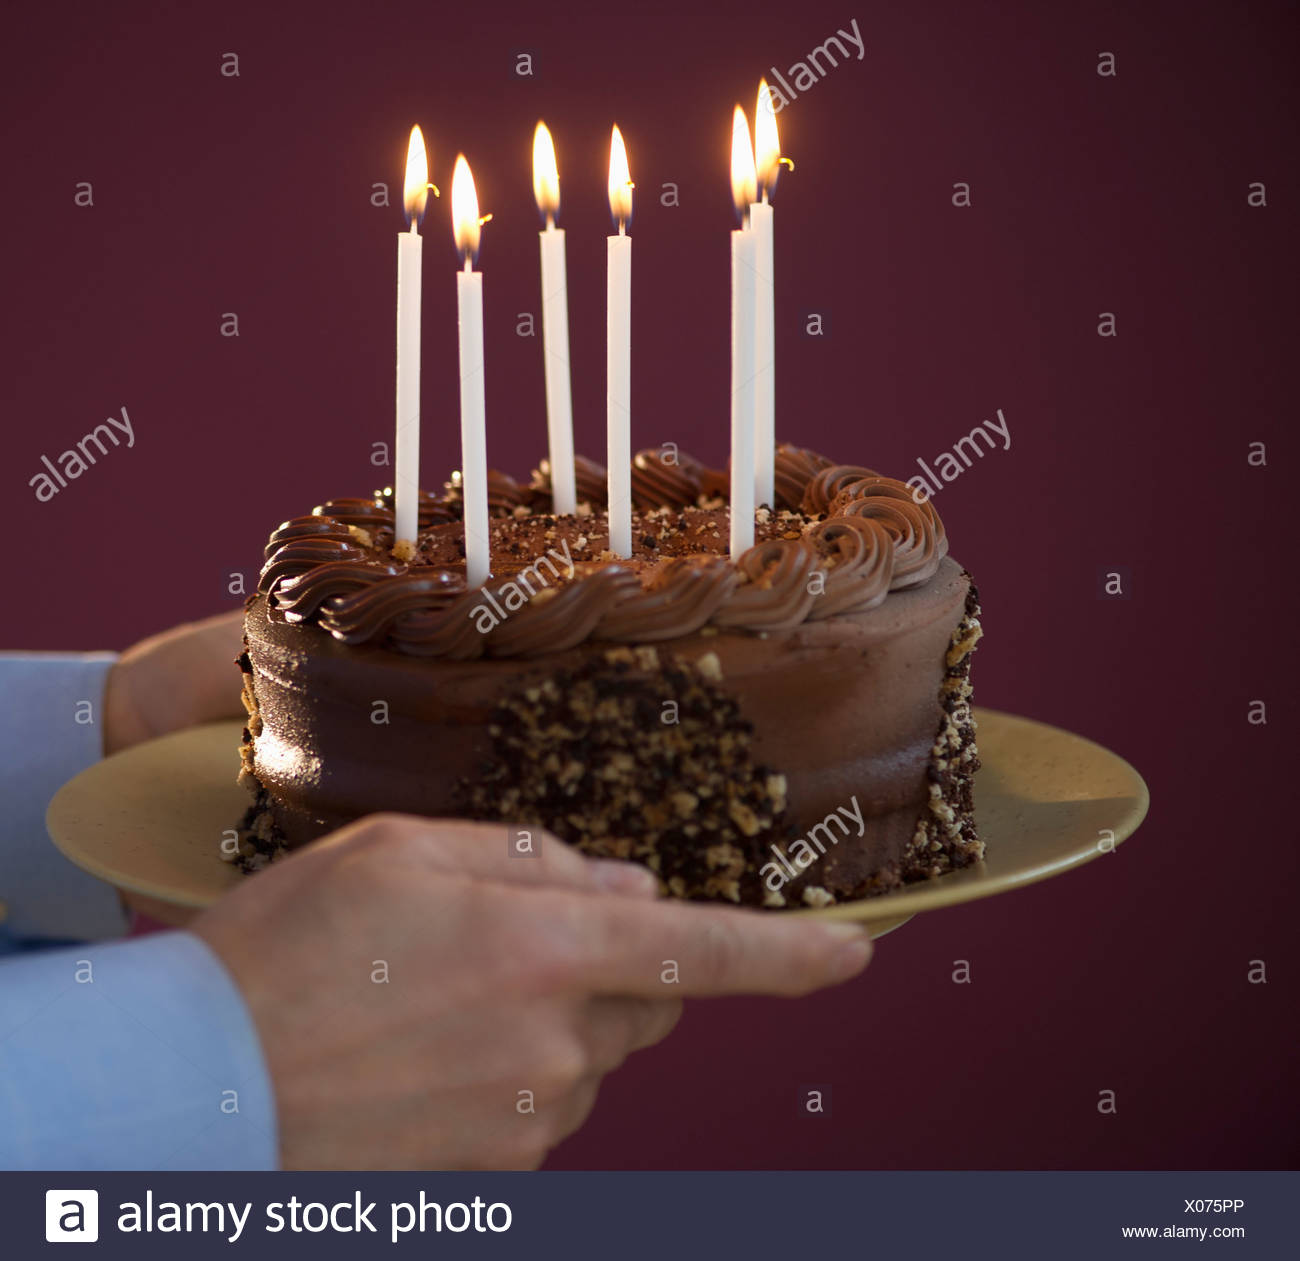 Incredible Studio Shot Of Man Holding Chocolate Birthday Cake Stock Photo Birthday Cards Printable Trancafe Filternl